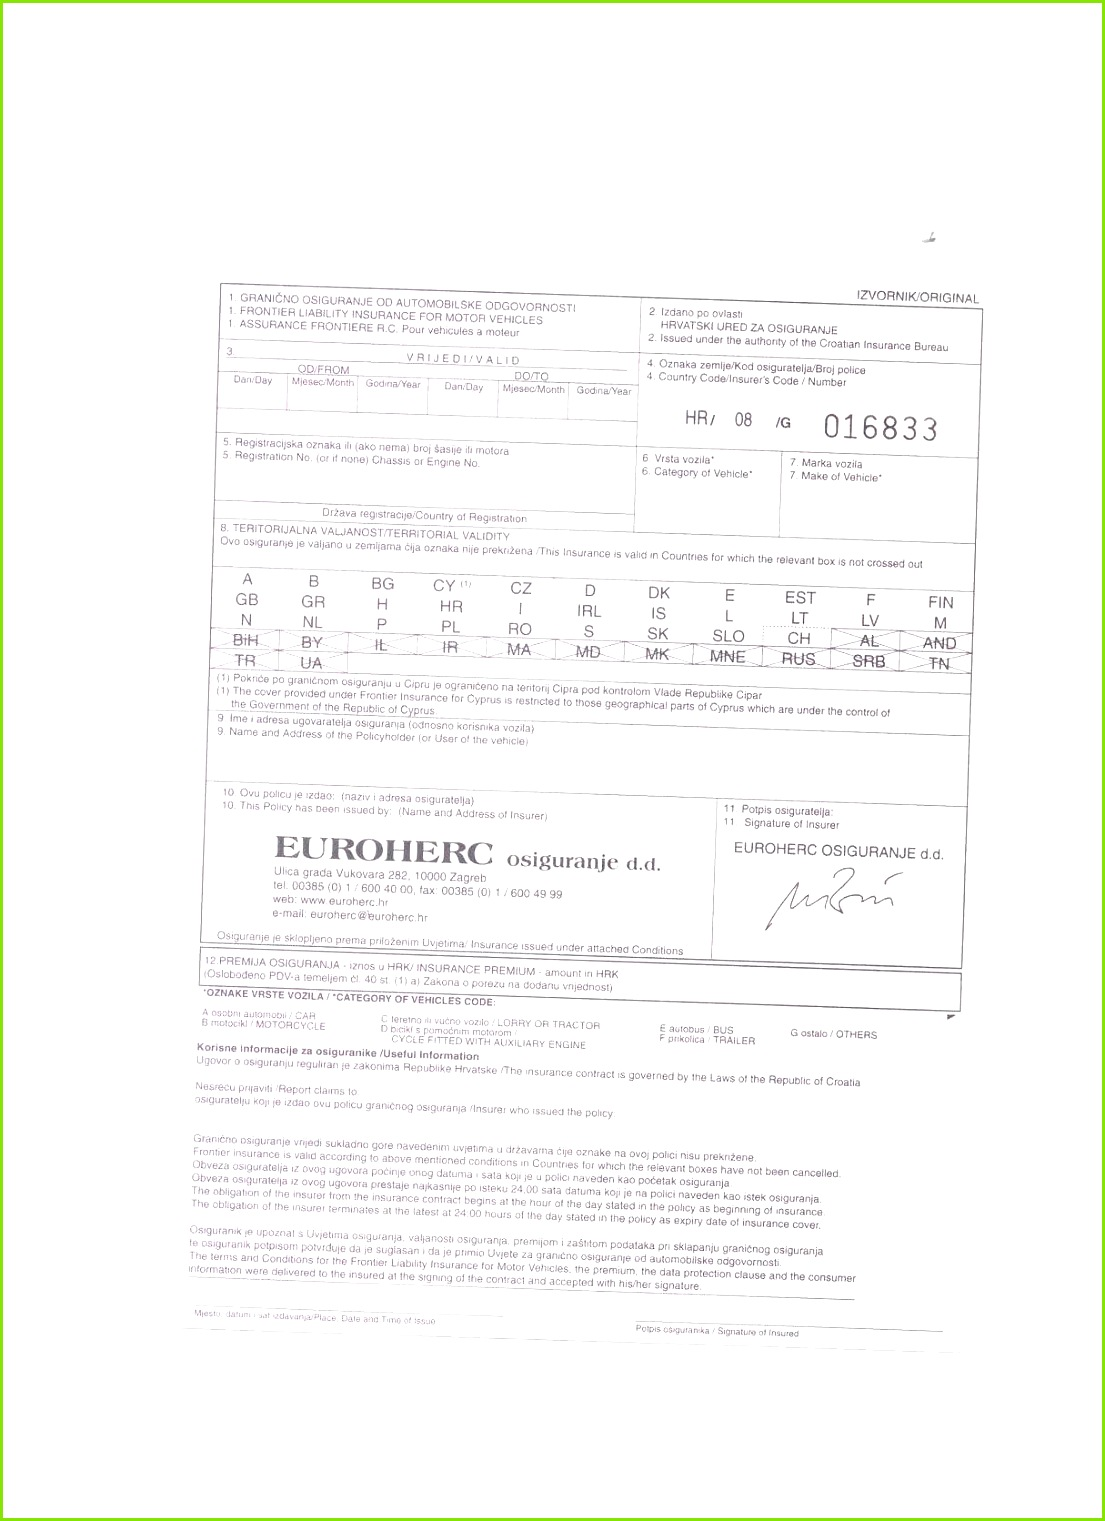 Dave Ramsey Bud Sheet Printable Beautiful Dave Ramsey Bud Sheets Pdf Elegant Printable Monthly Bud Template